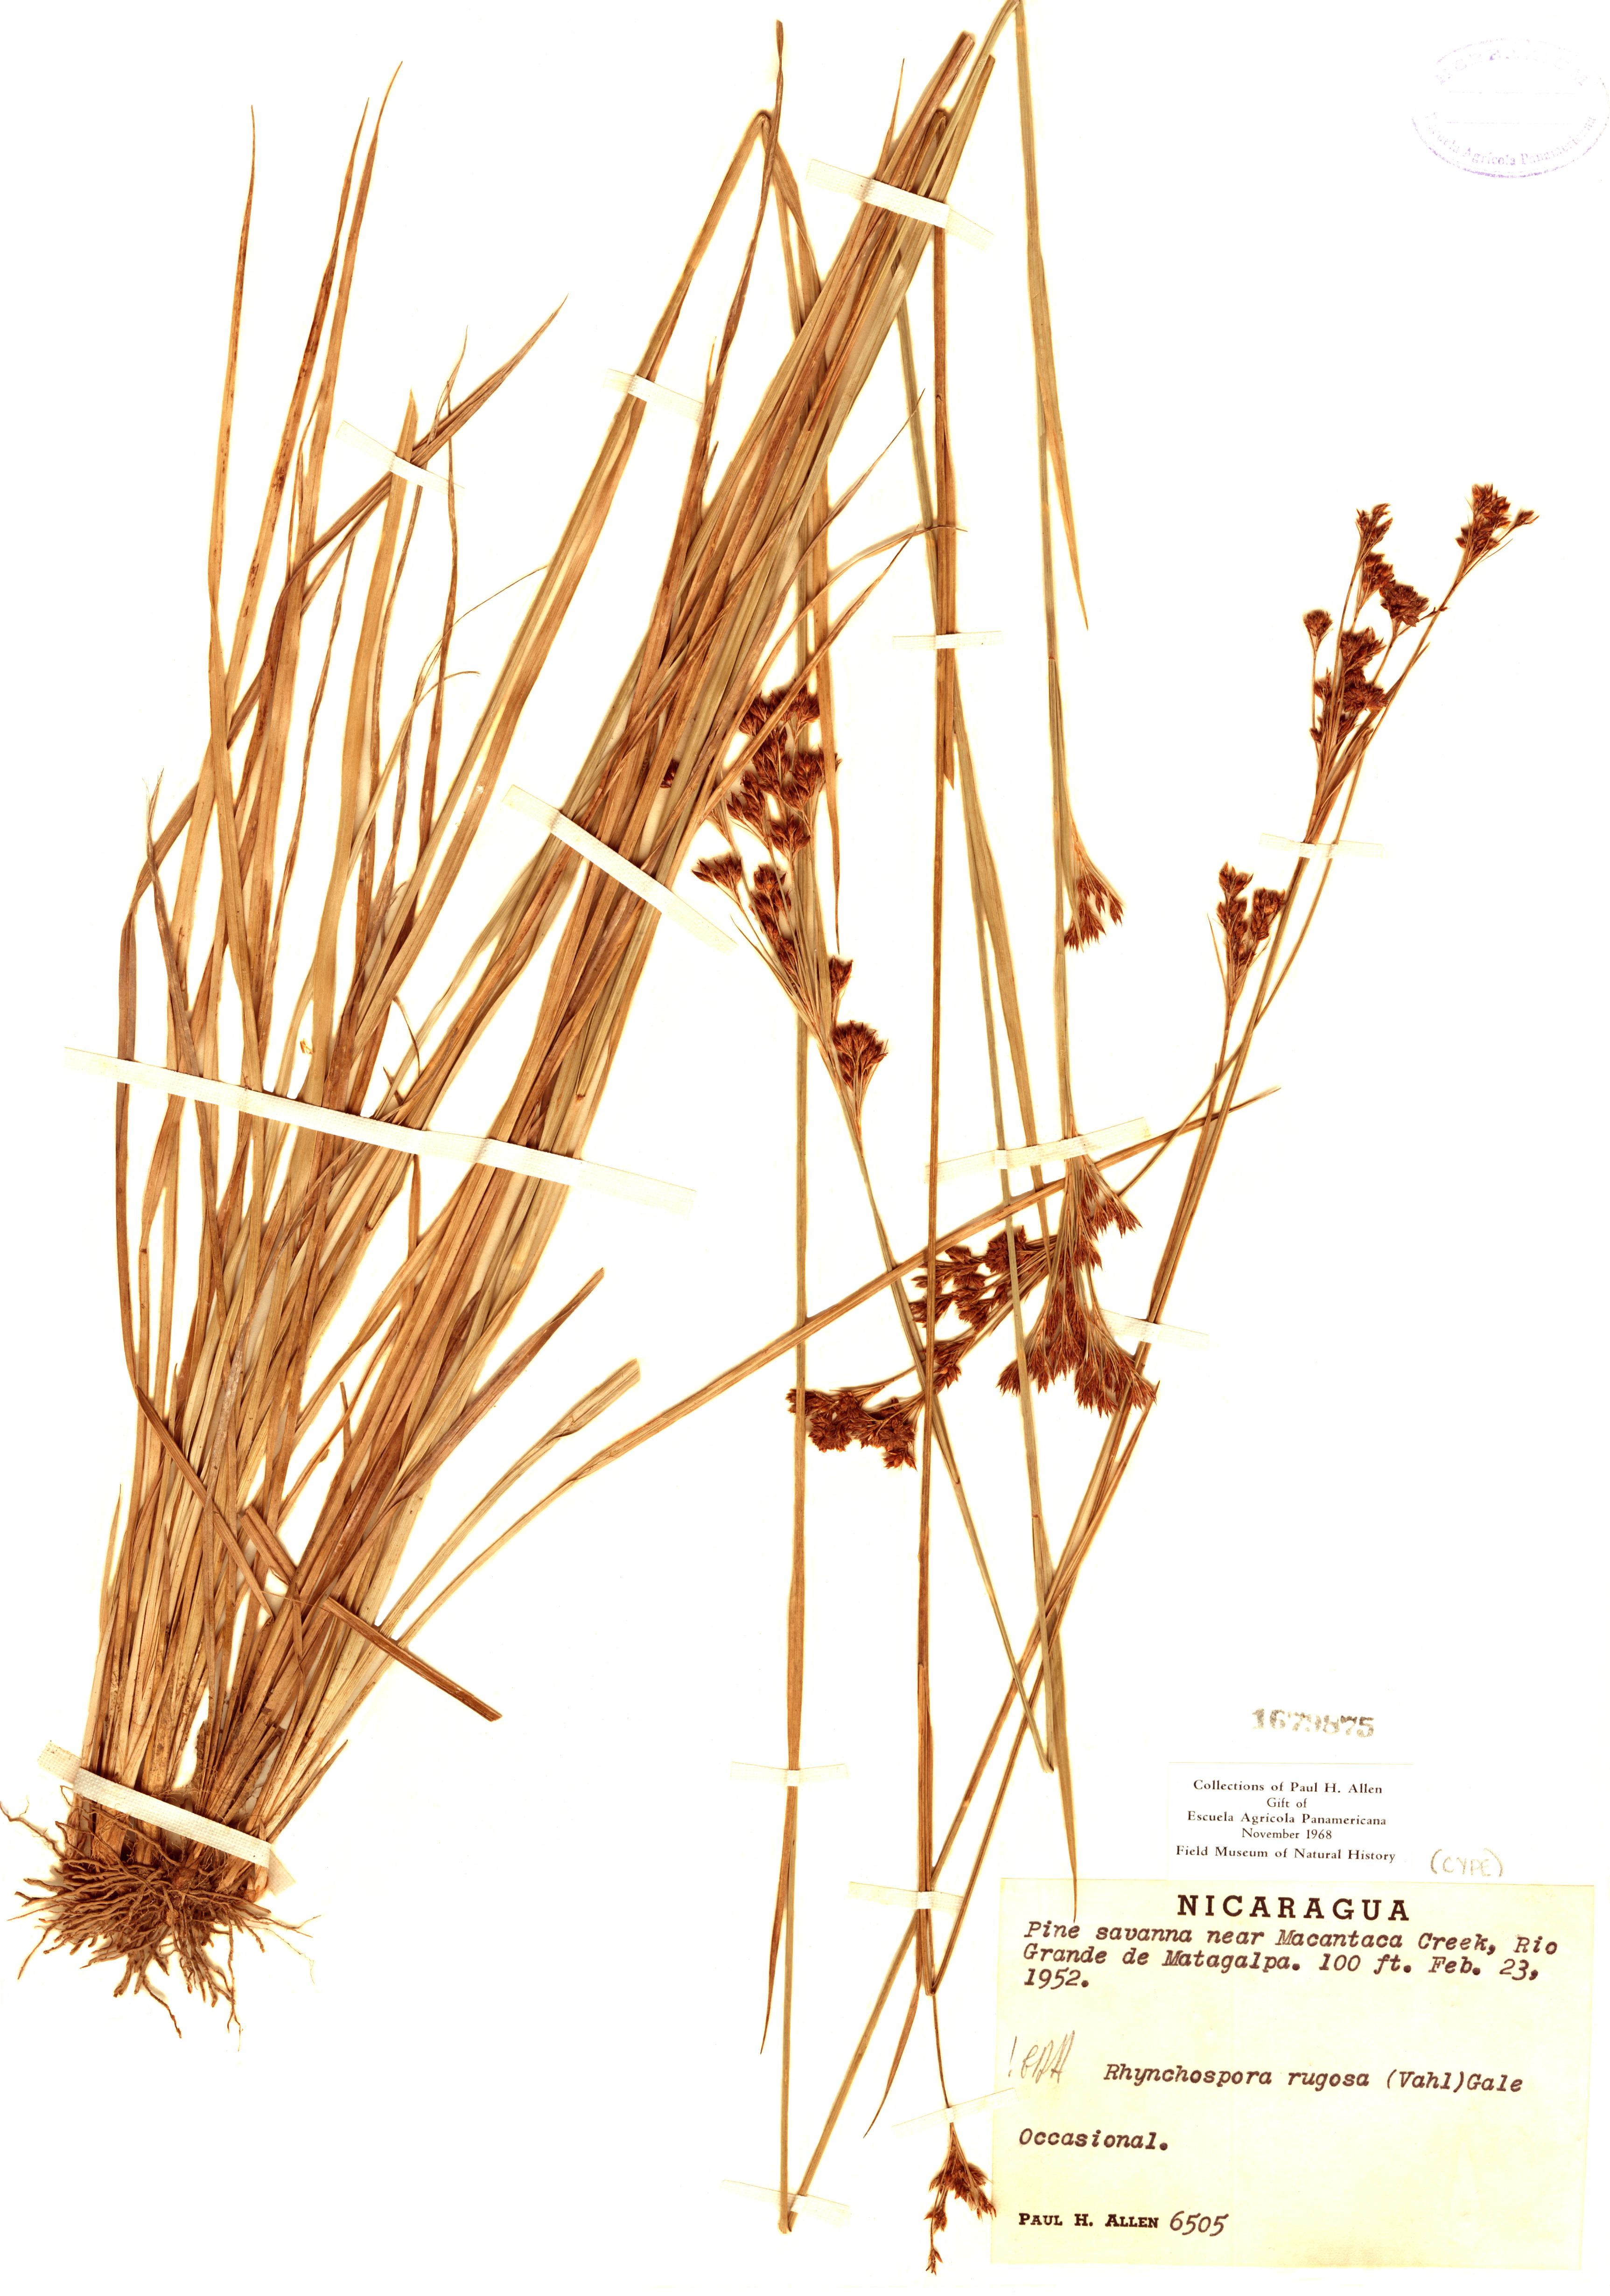 Specimen: Rhynchospora rugosa